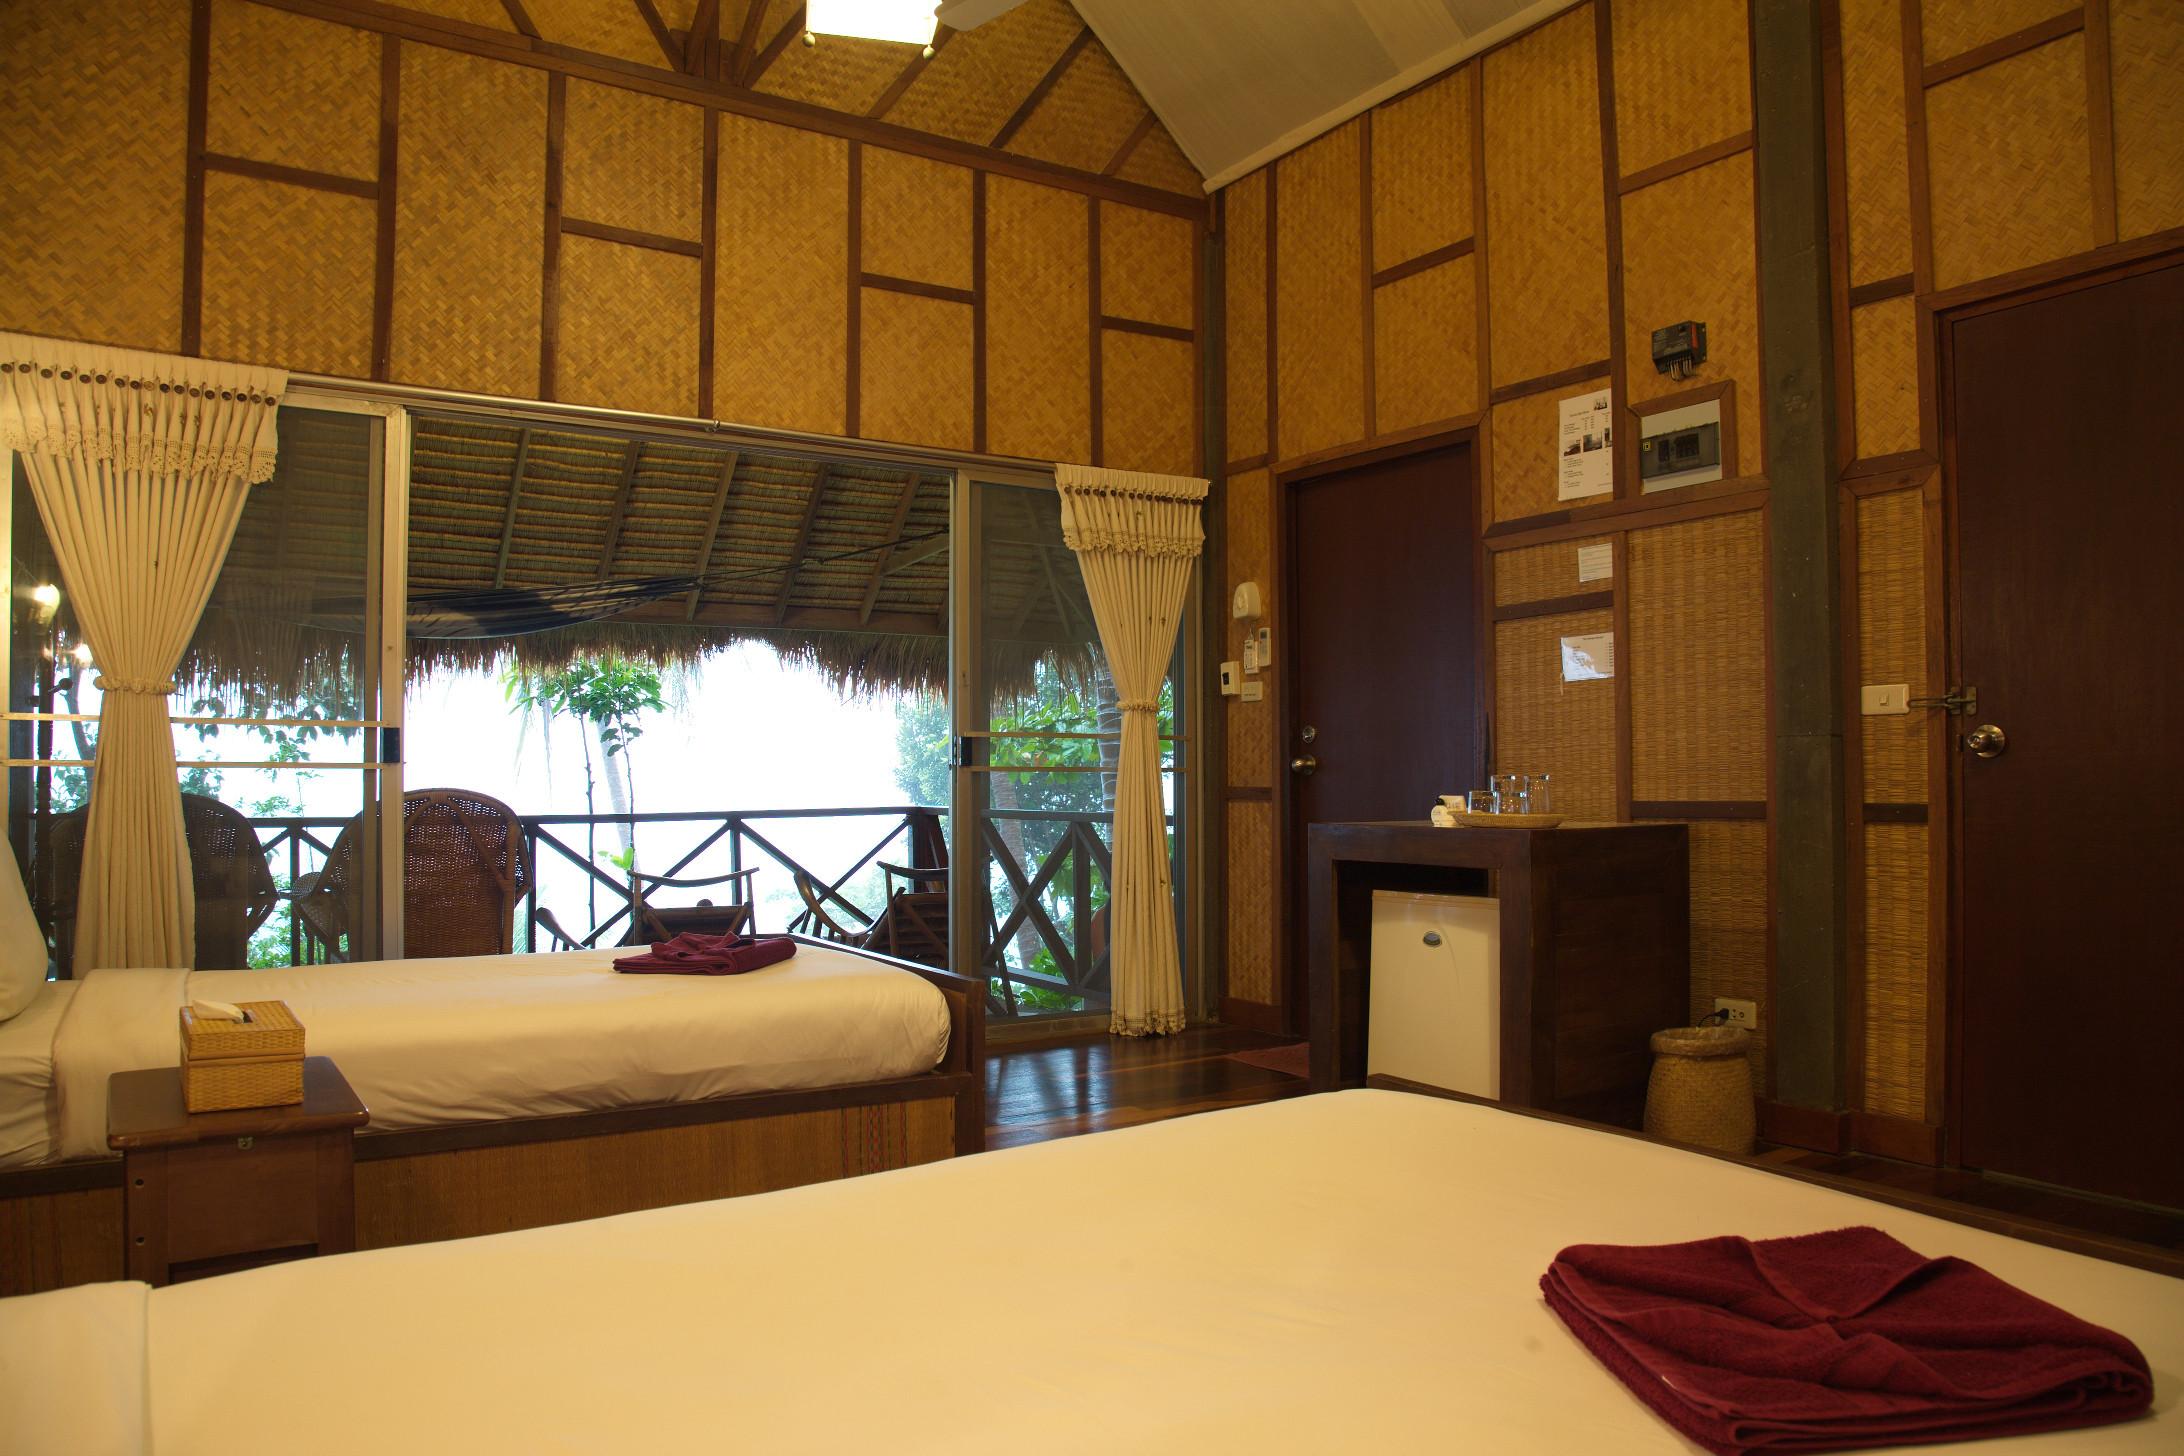 Stylish Bungalows bungalow | narima bungalow resort